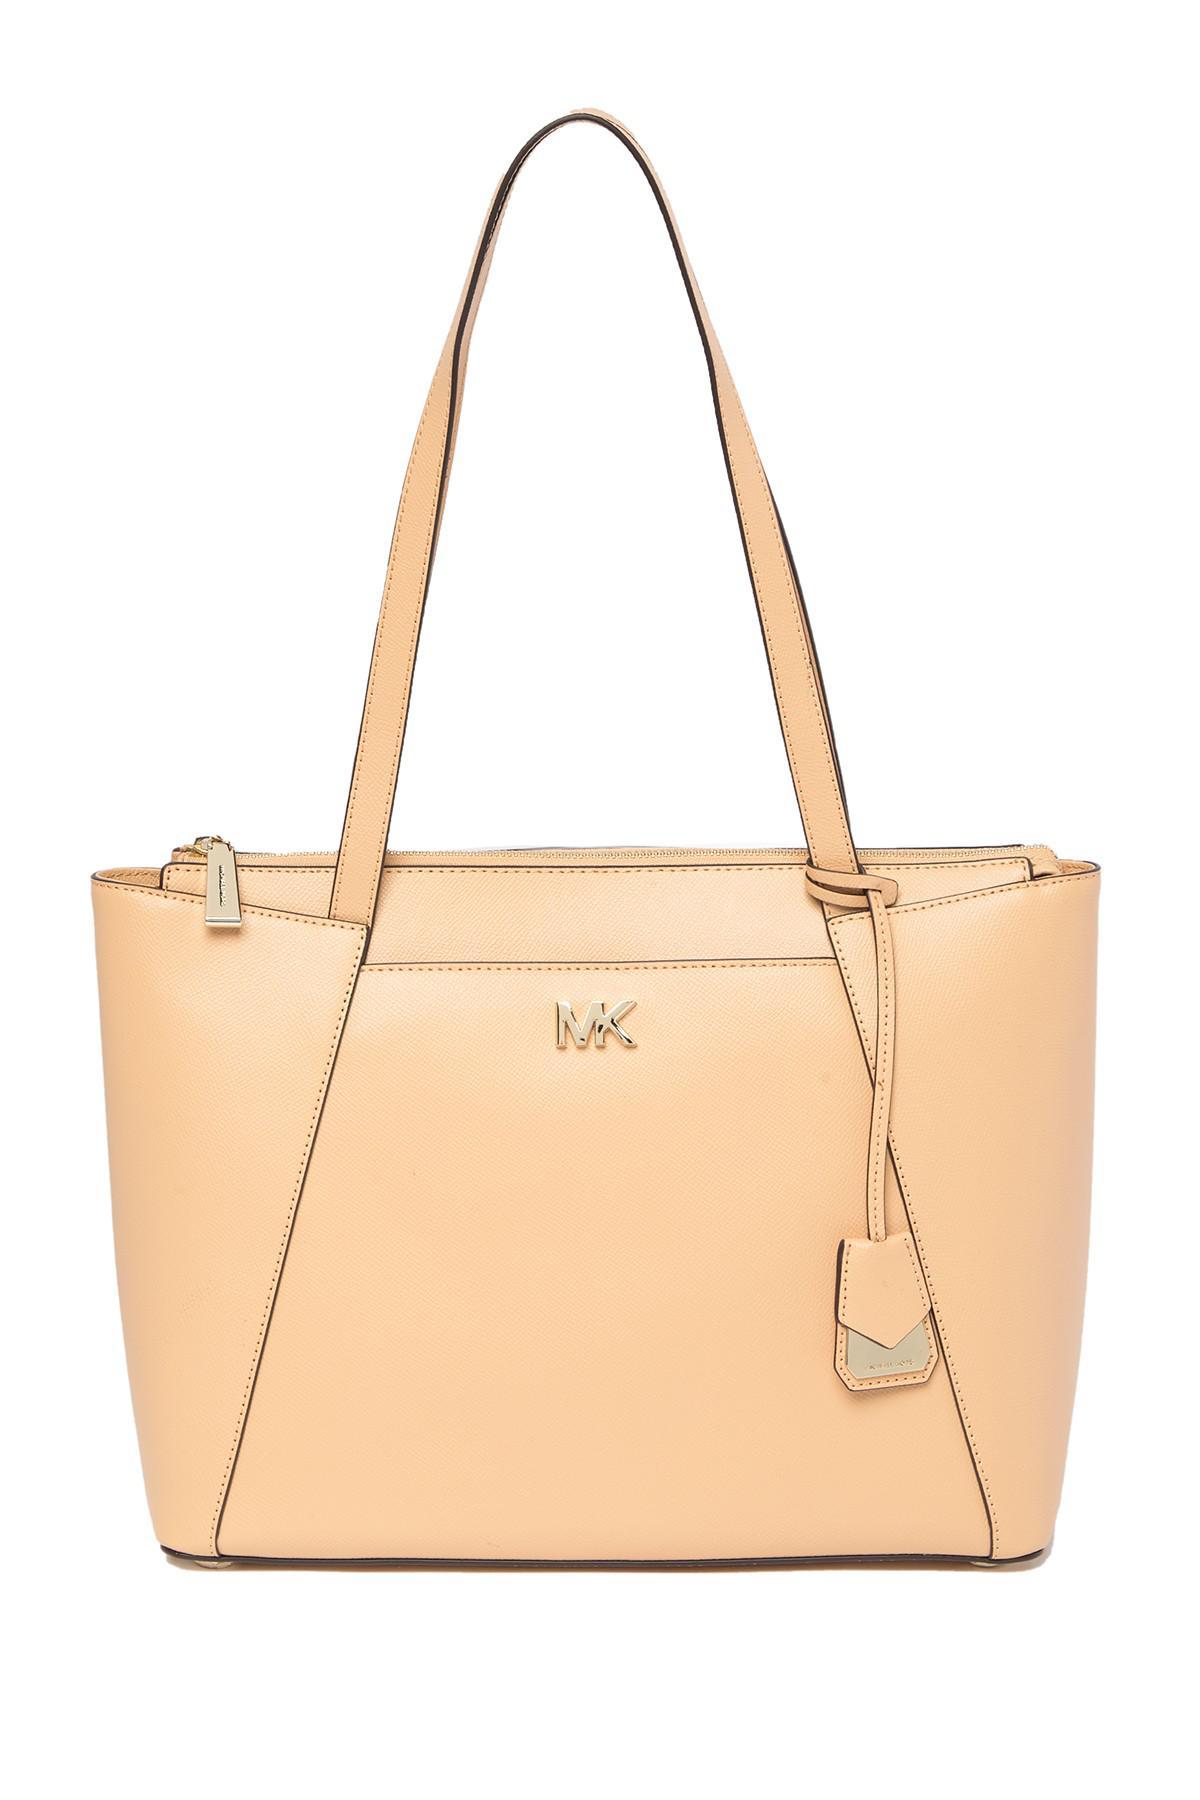 aa71985b6e6d Lyst - MICHAEL Michael Kors Maddie Leather Tote Bag